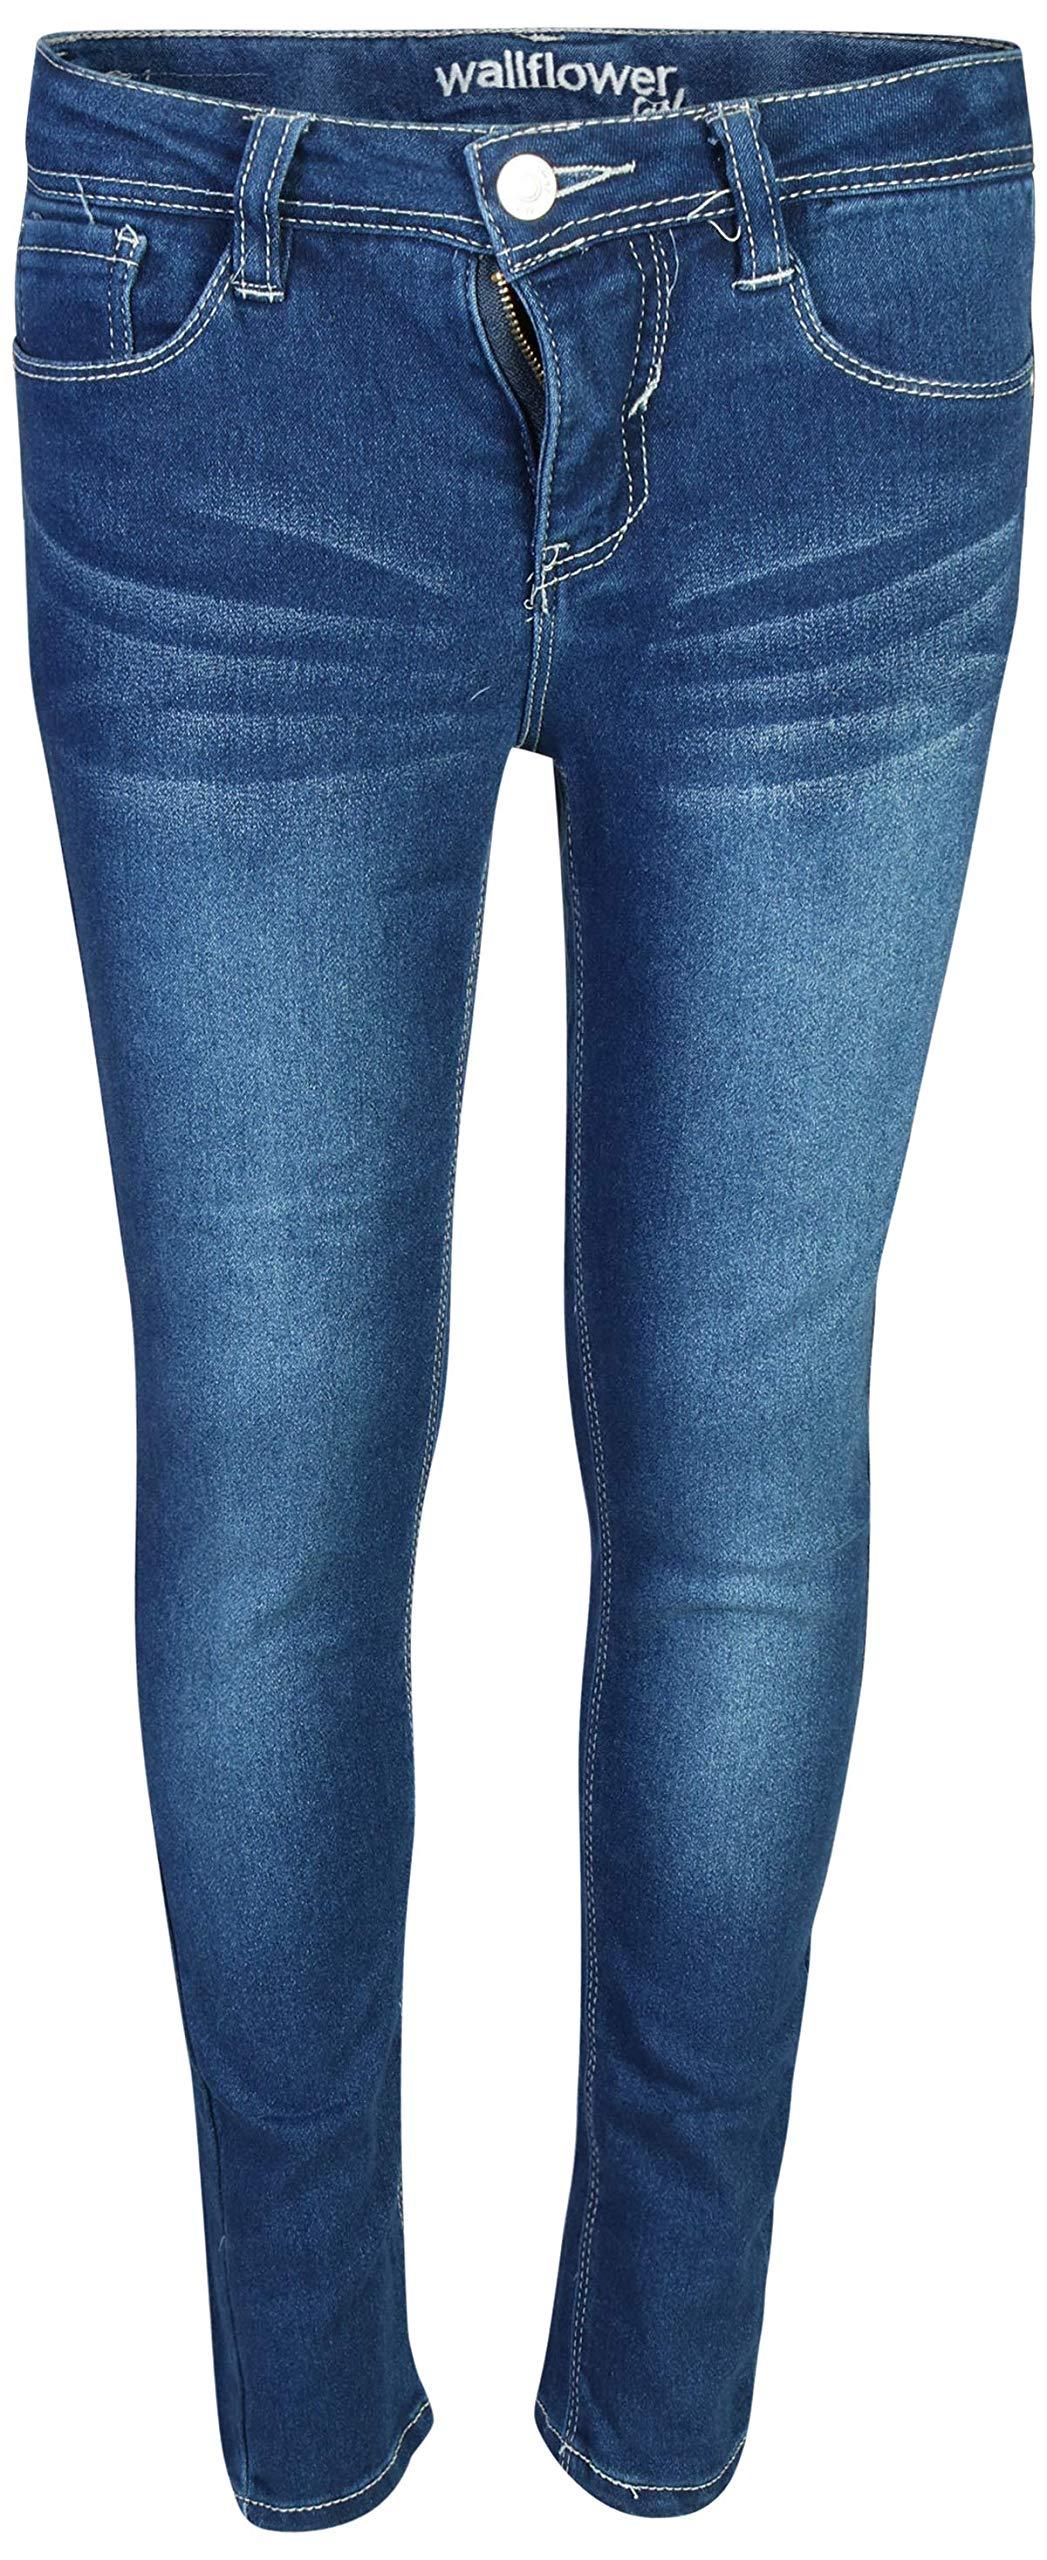 WallFlower Girls Soft Stretch Skinny Denim Jeans, Dark Wash, Size 14'